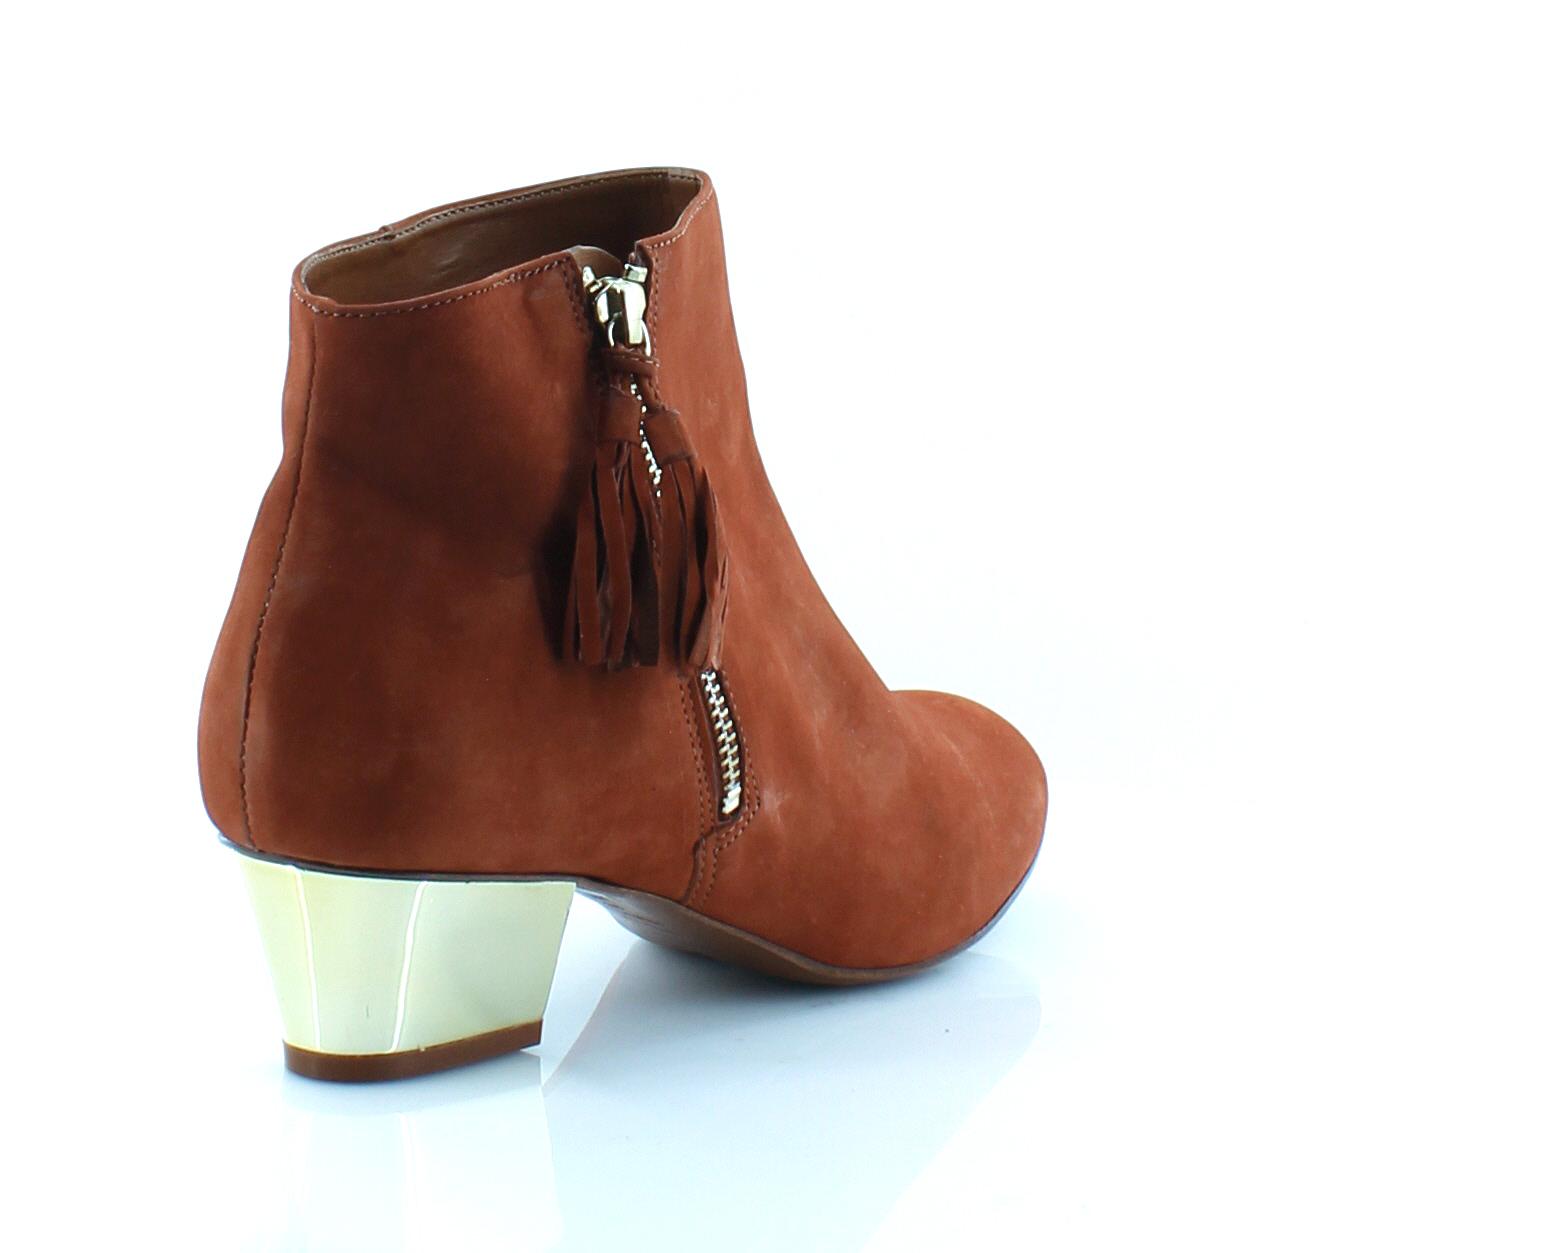 pierazzoli gomme arezzo shoes - photo#26